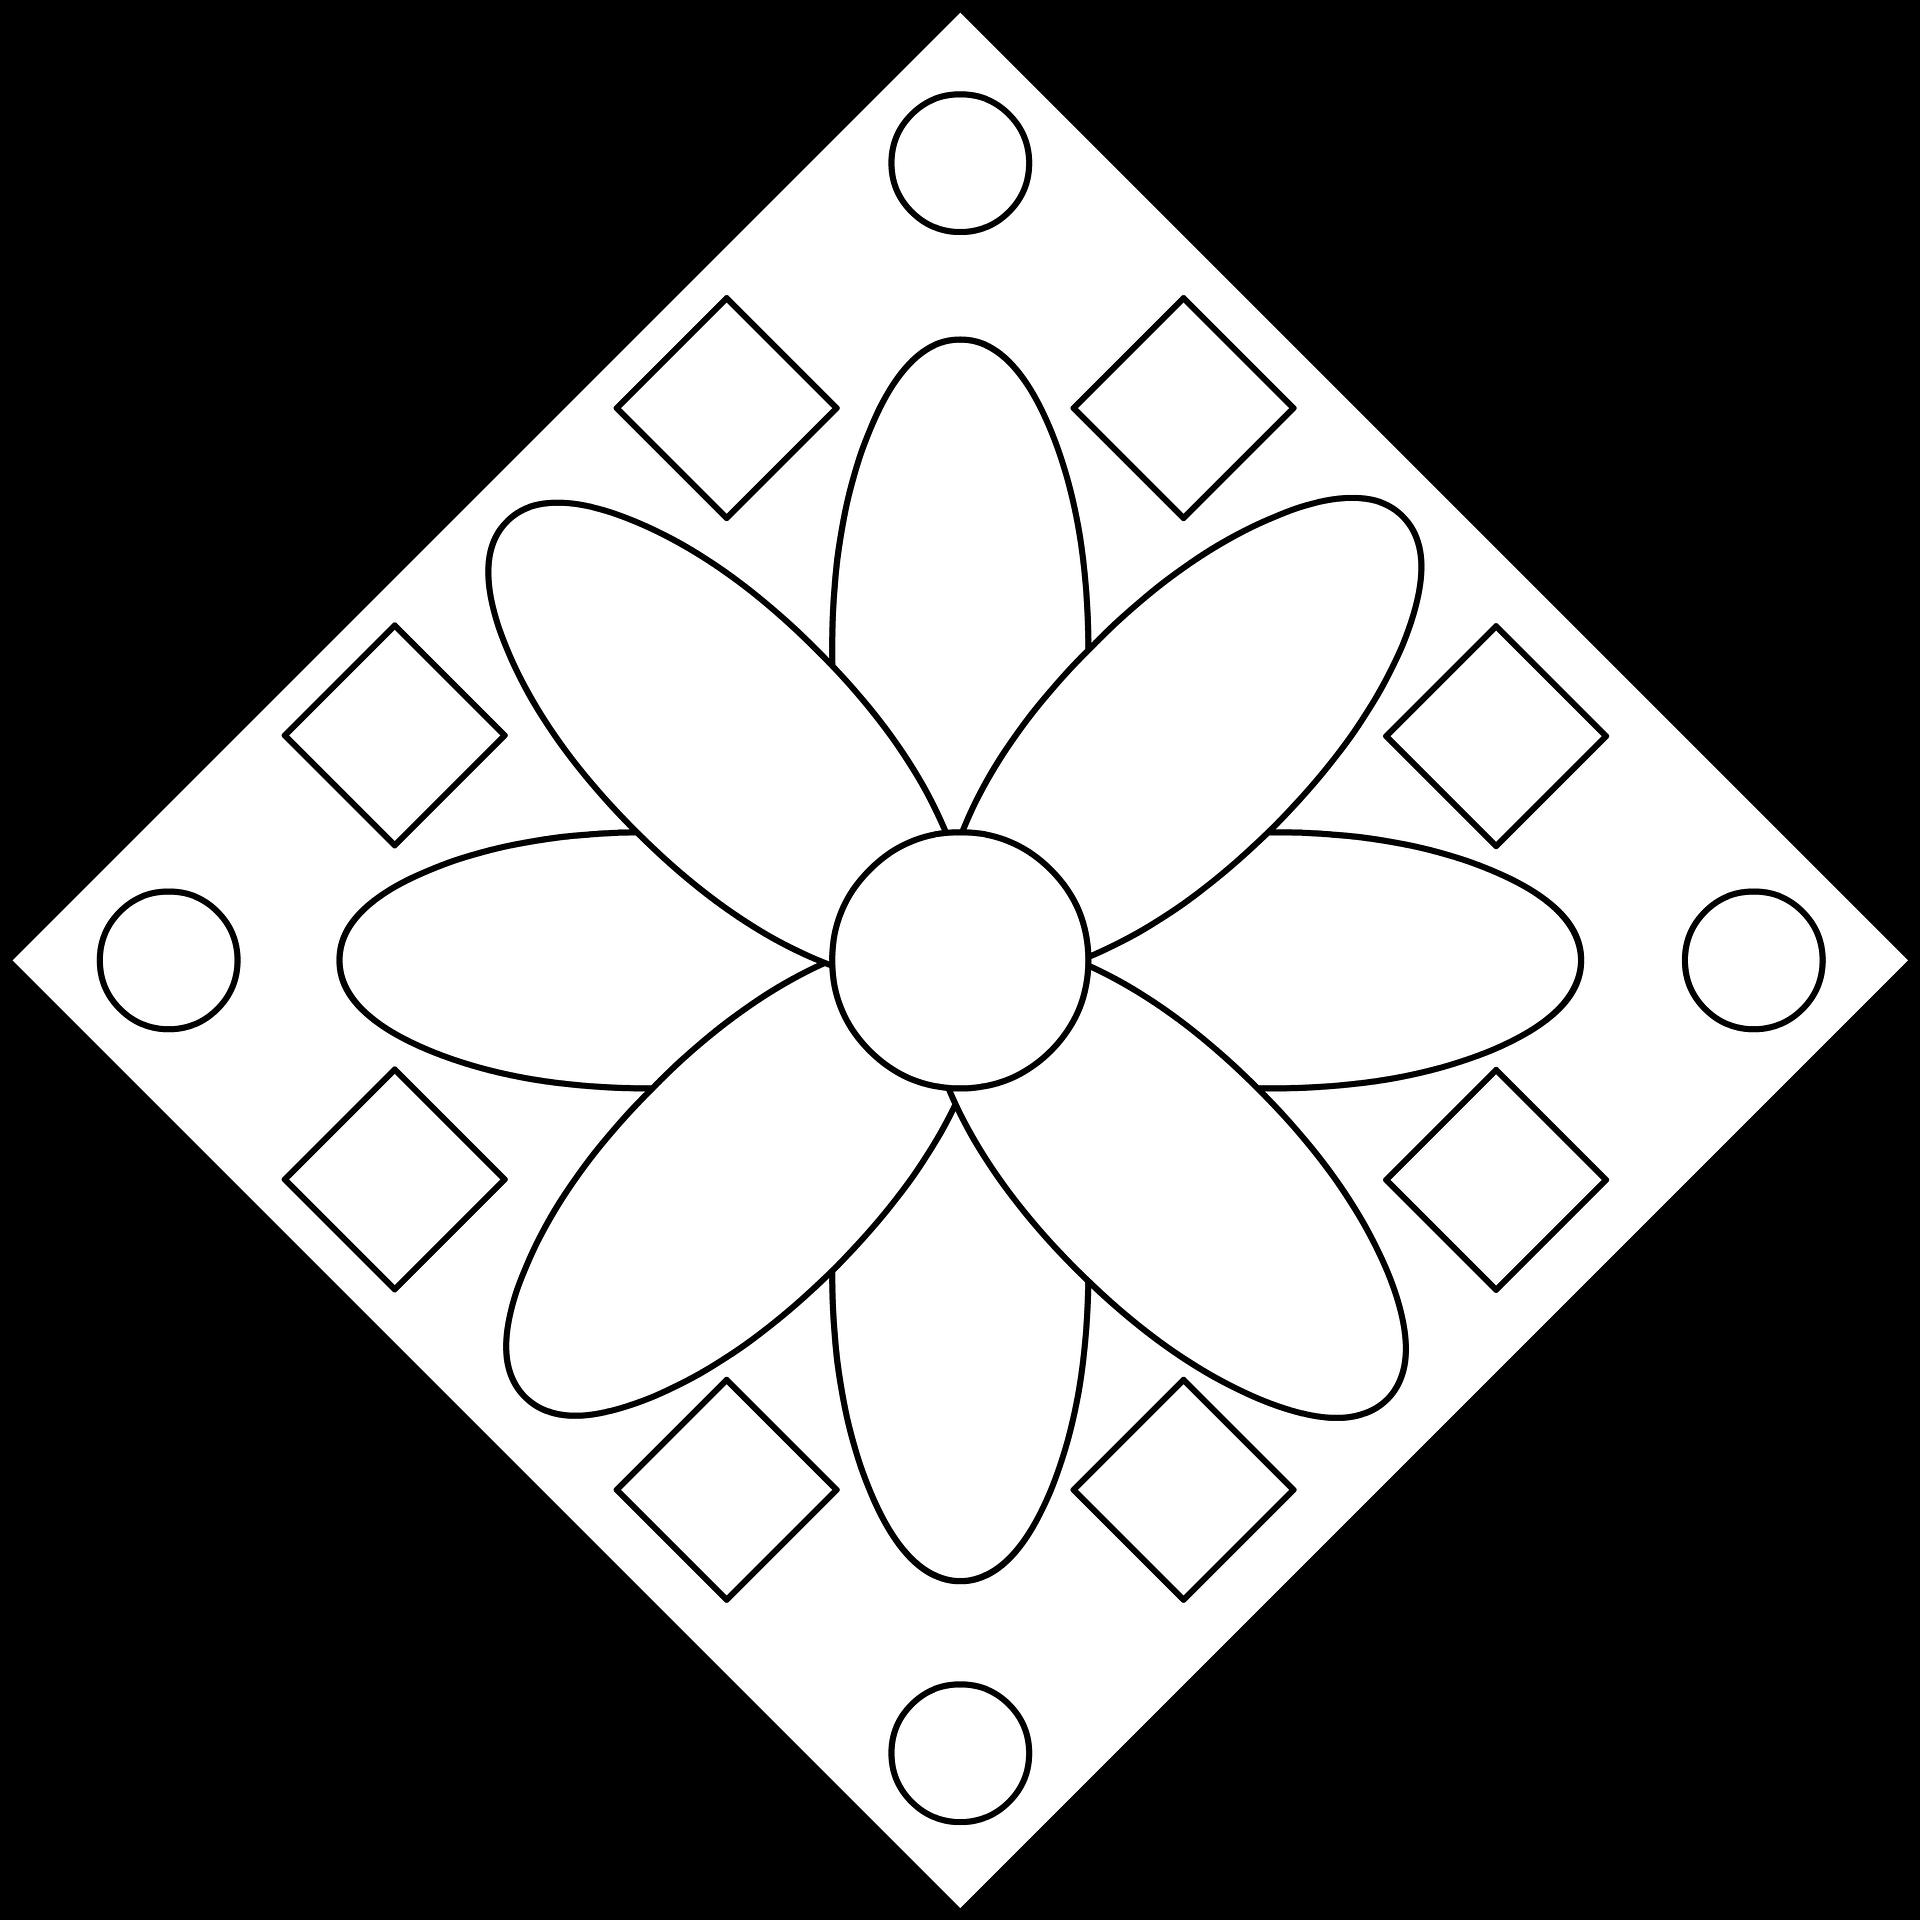 Imagenes de flores para colorear e imprimir